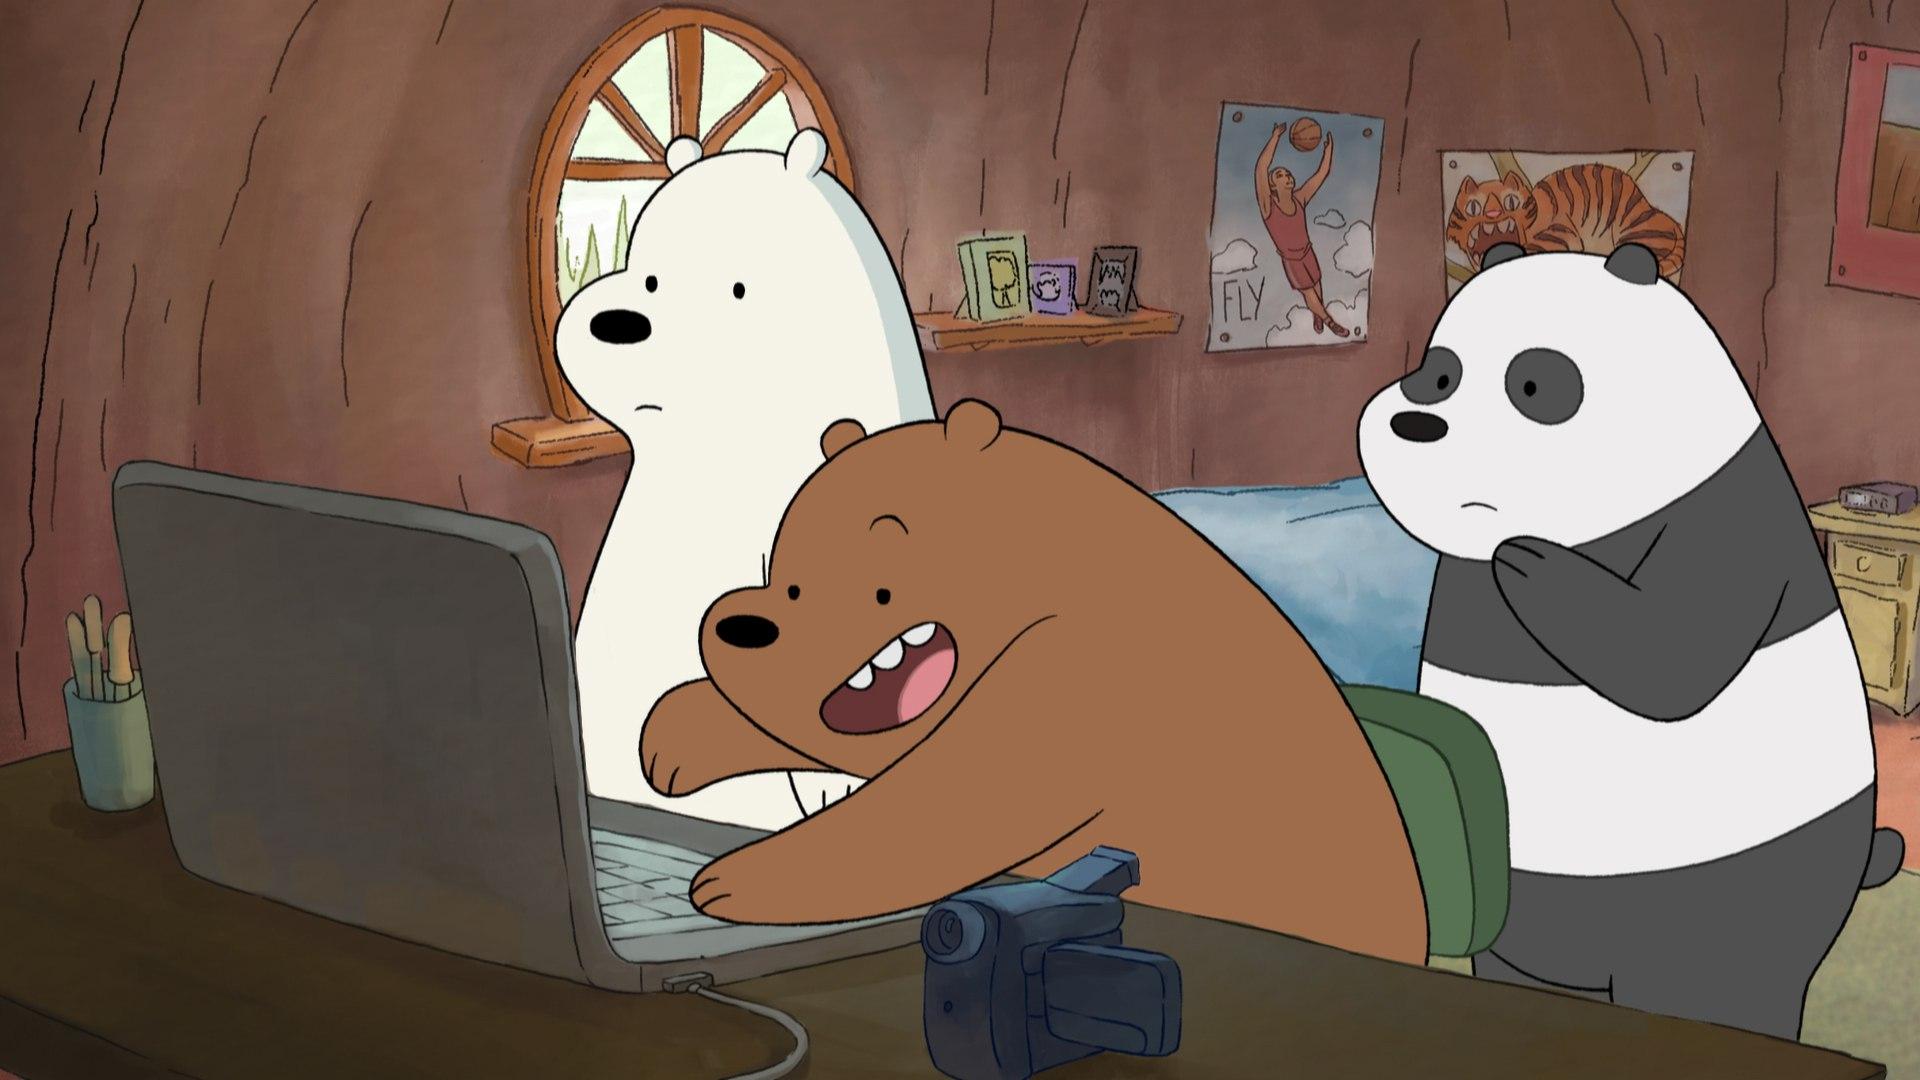 we bare bears christmas wallpaper - photo #16